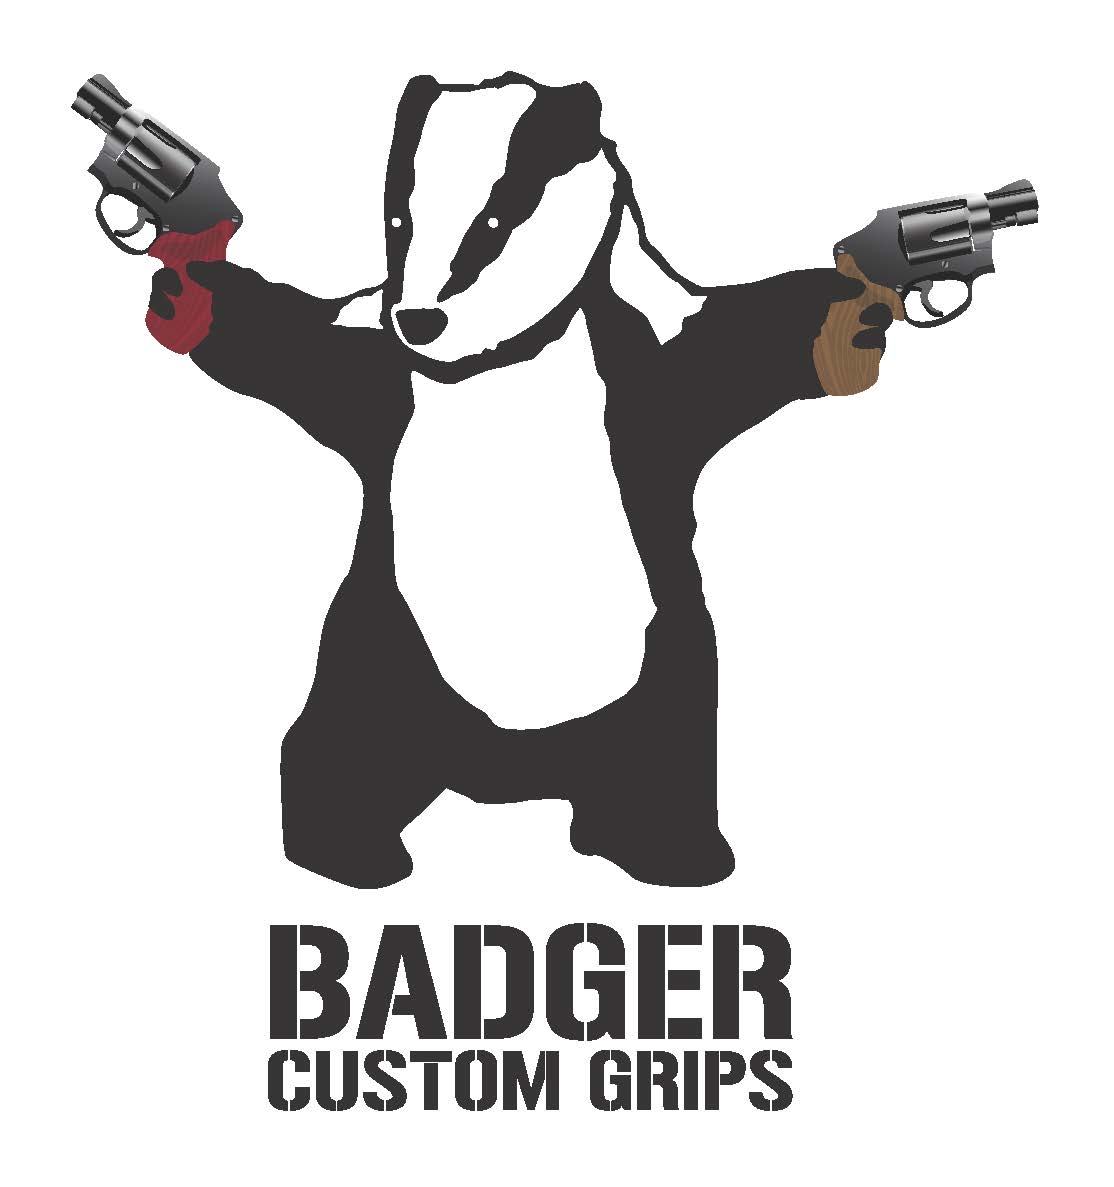 Ruger Wood Grips — Badger Custom Grips